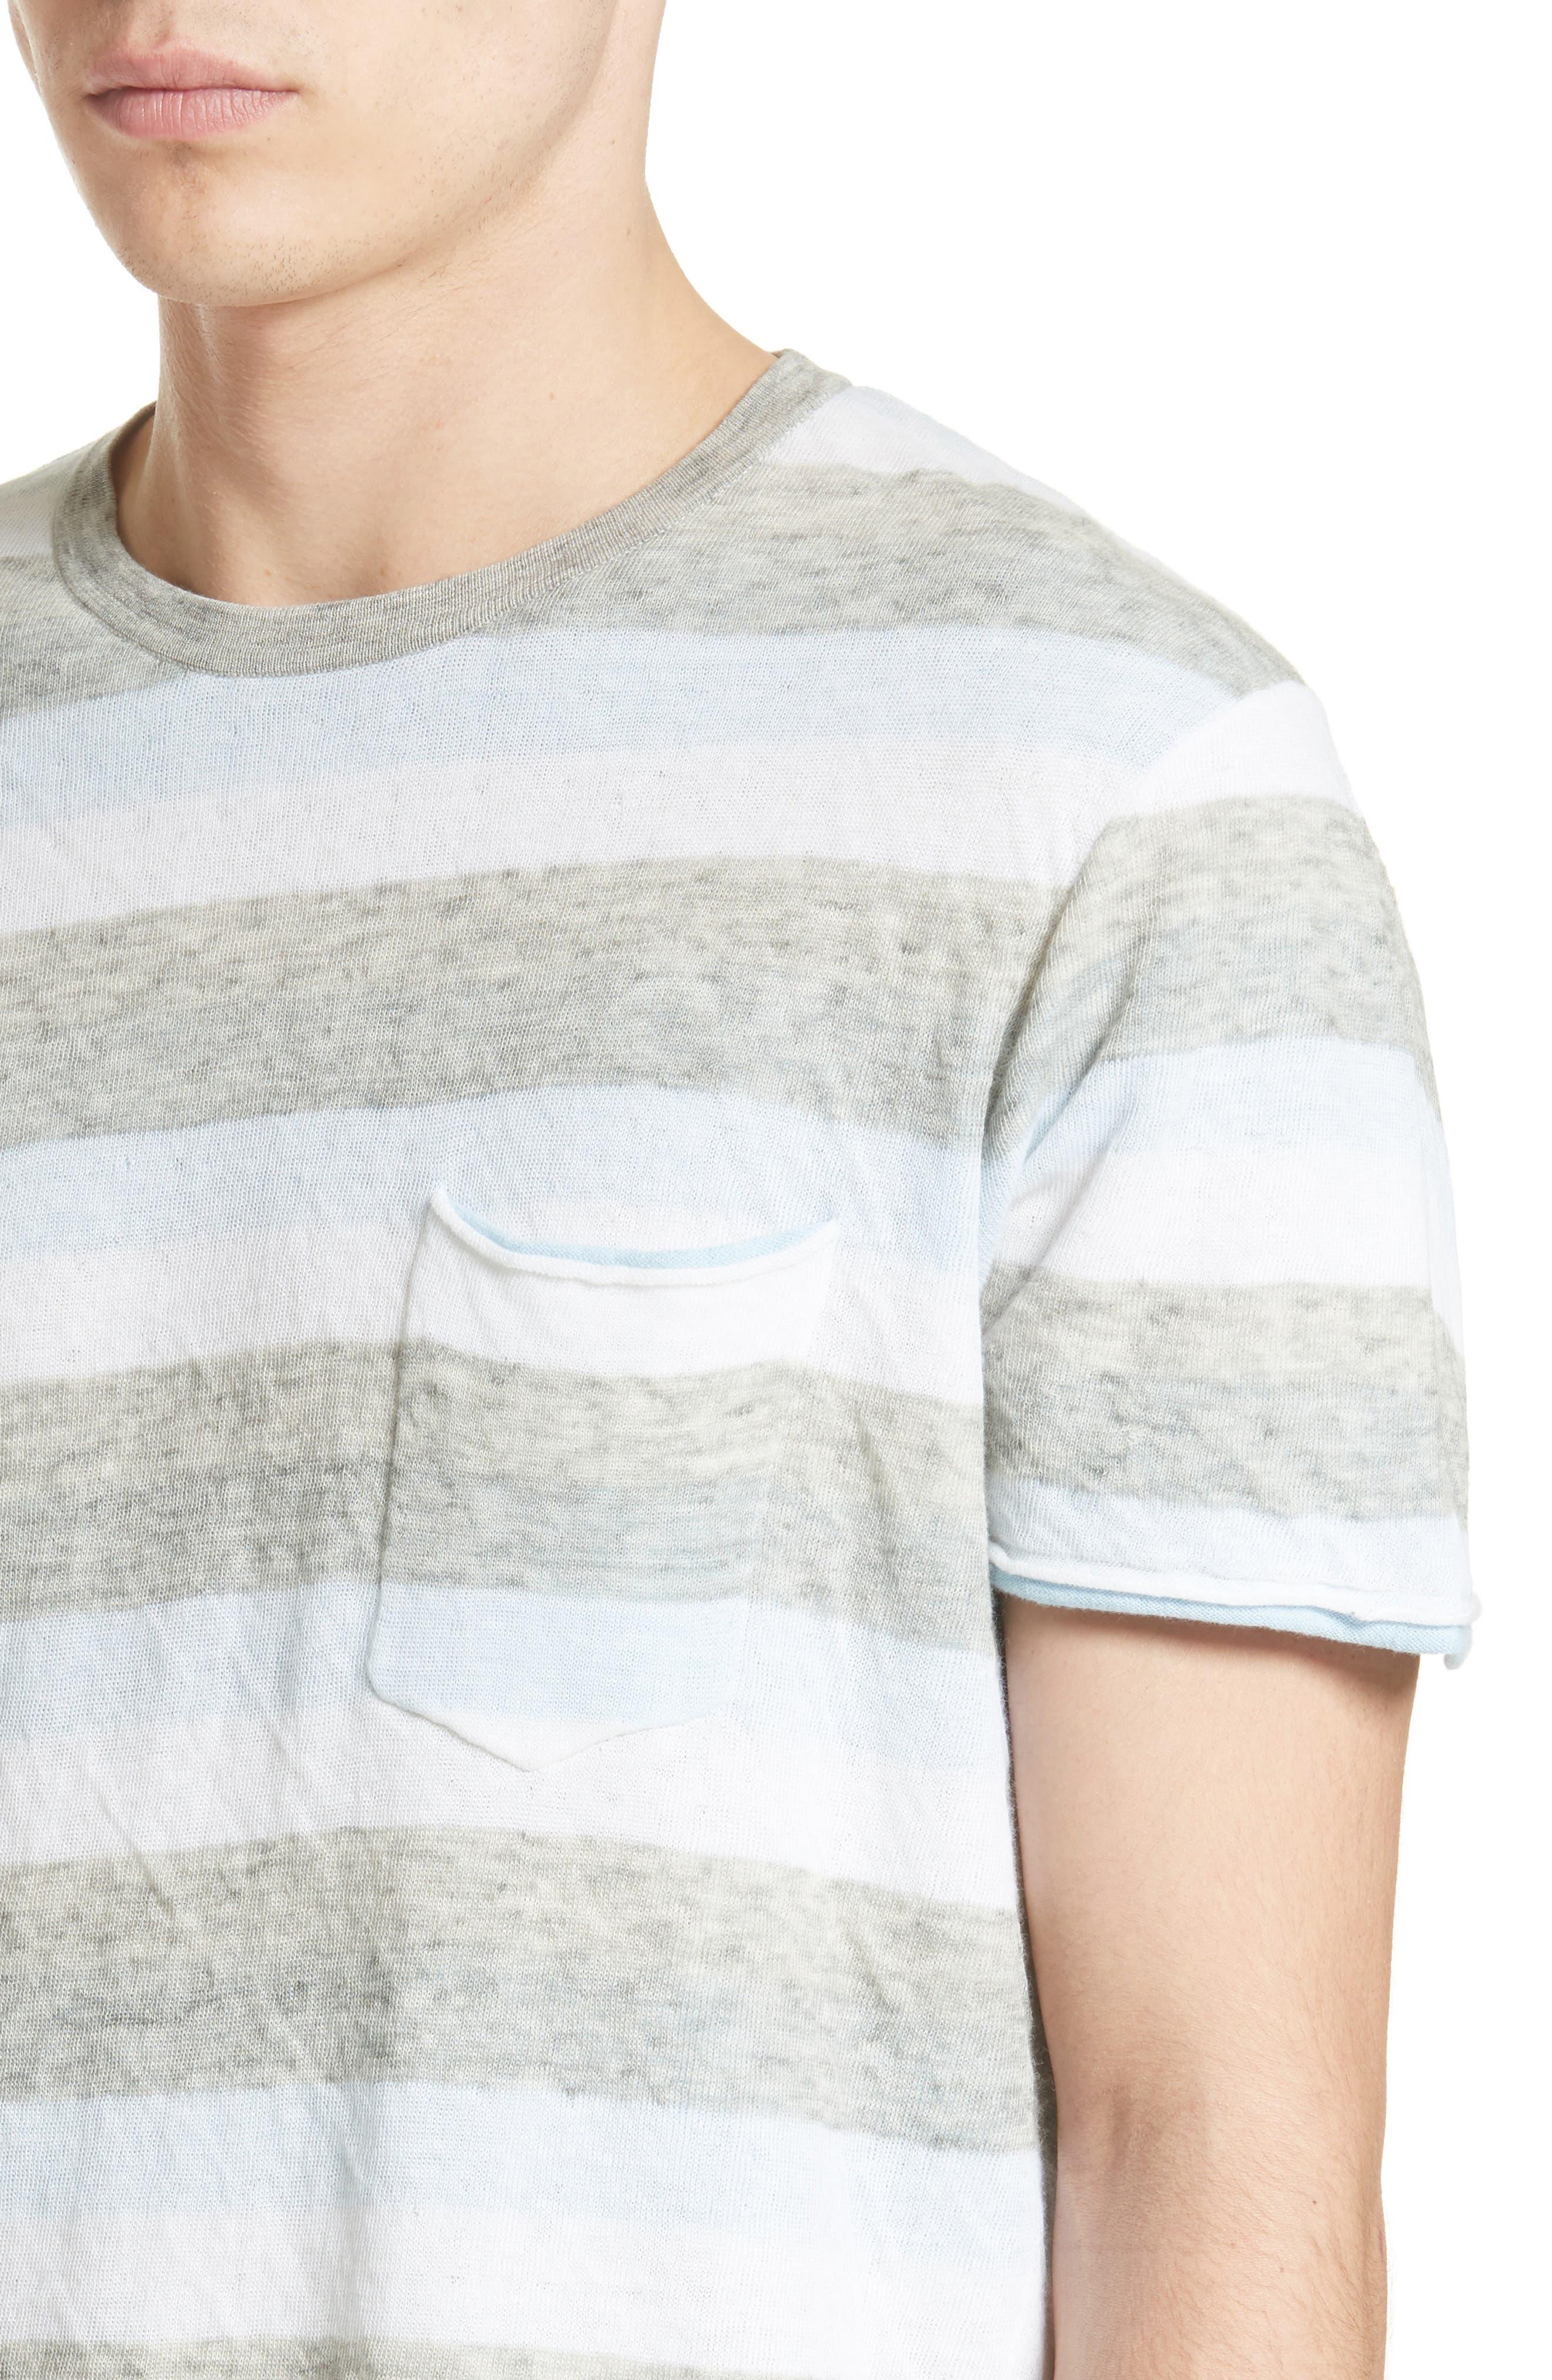 Tripp Cotton & Wool T-Shirt,                             Alternate thumbnail 4, color,                             461